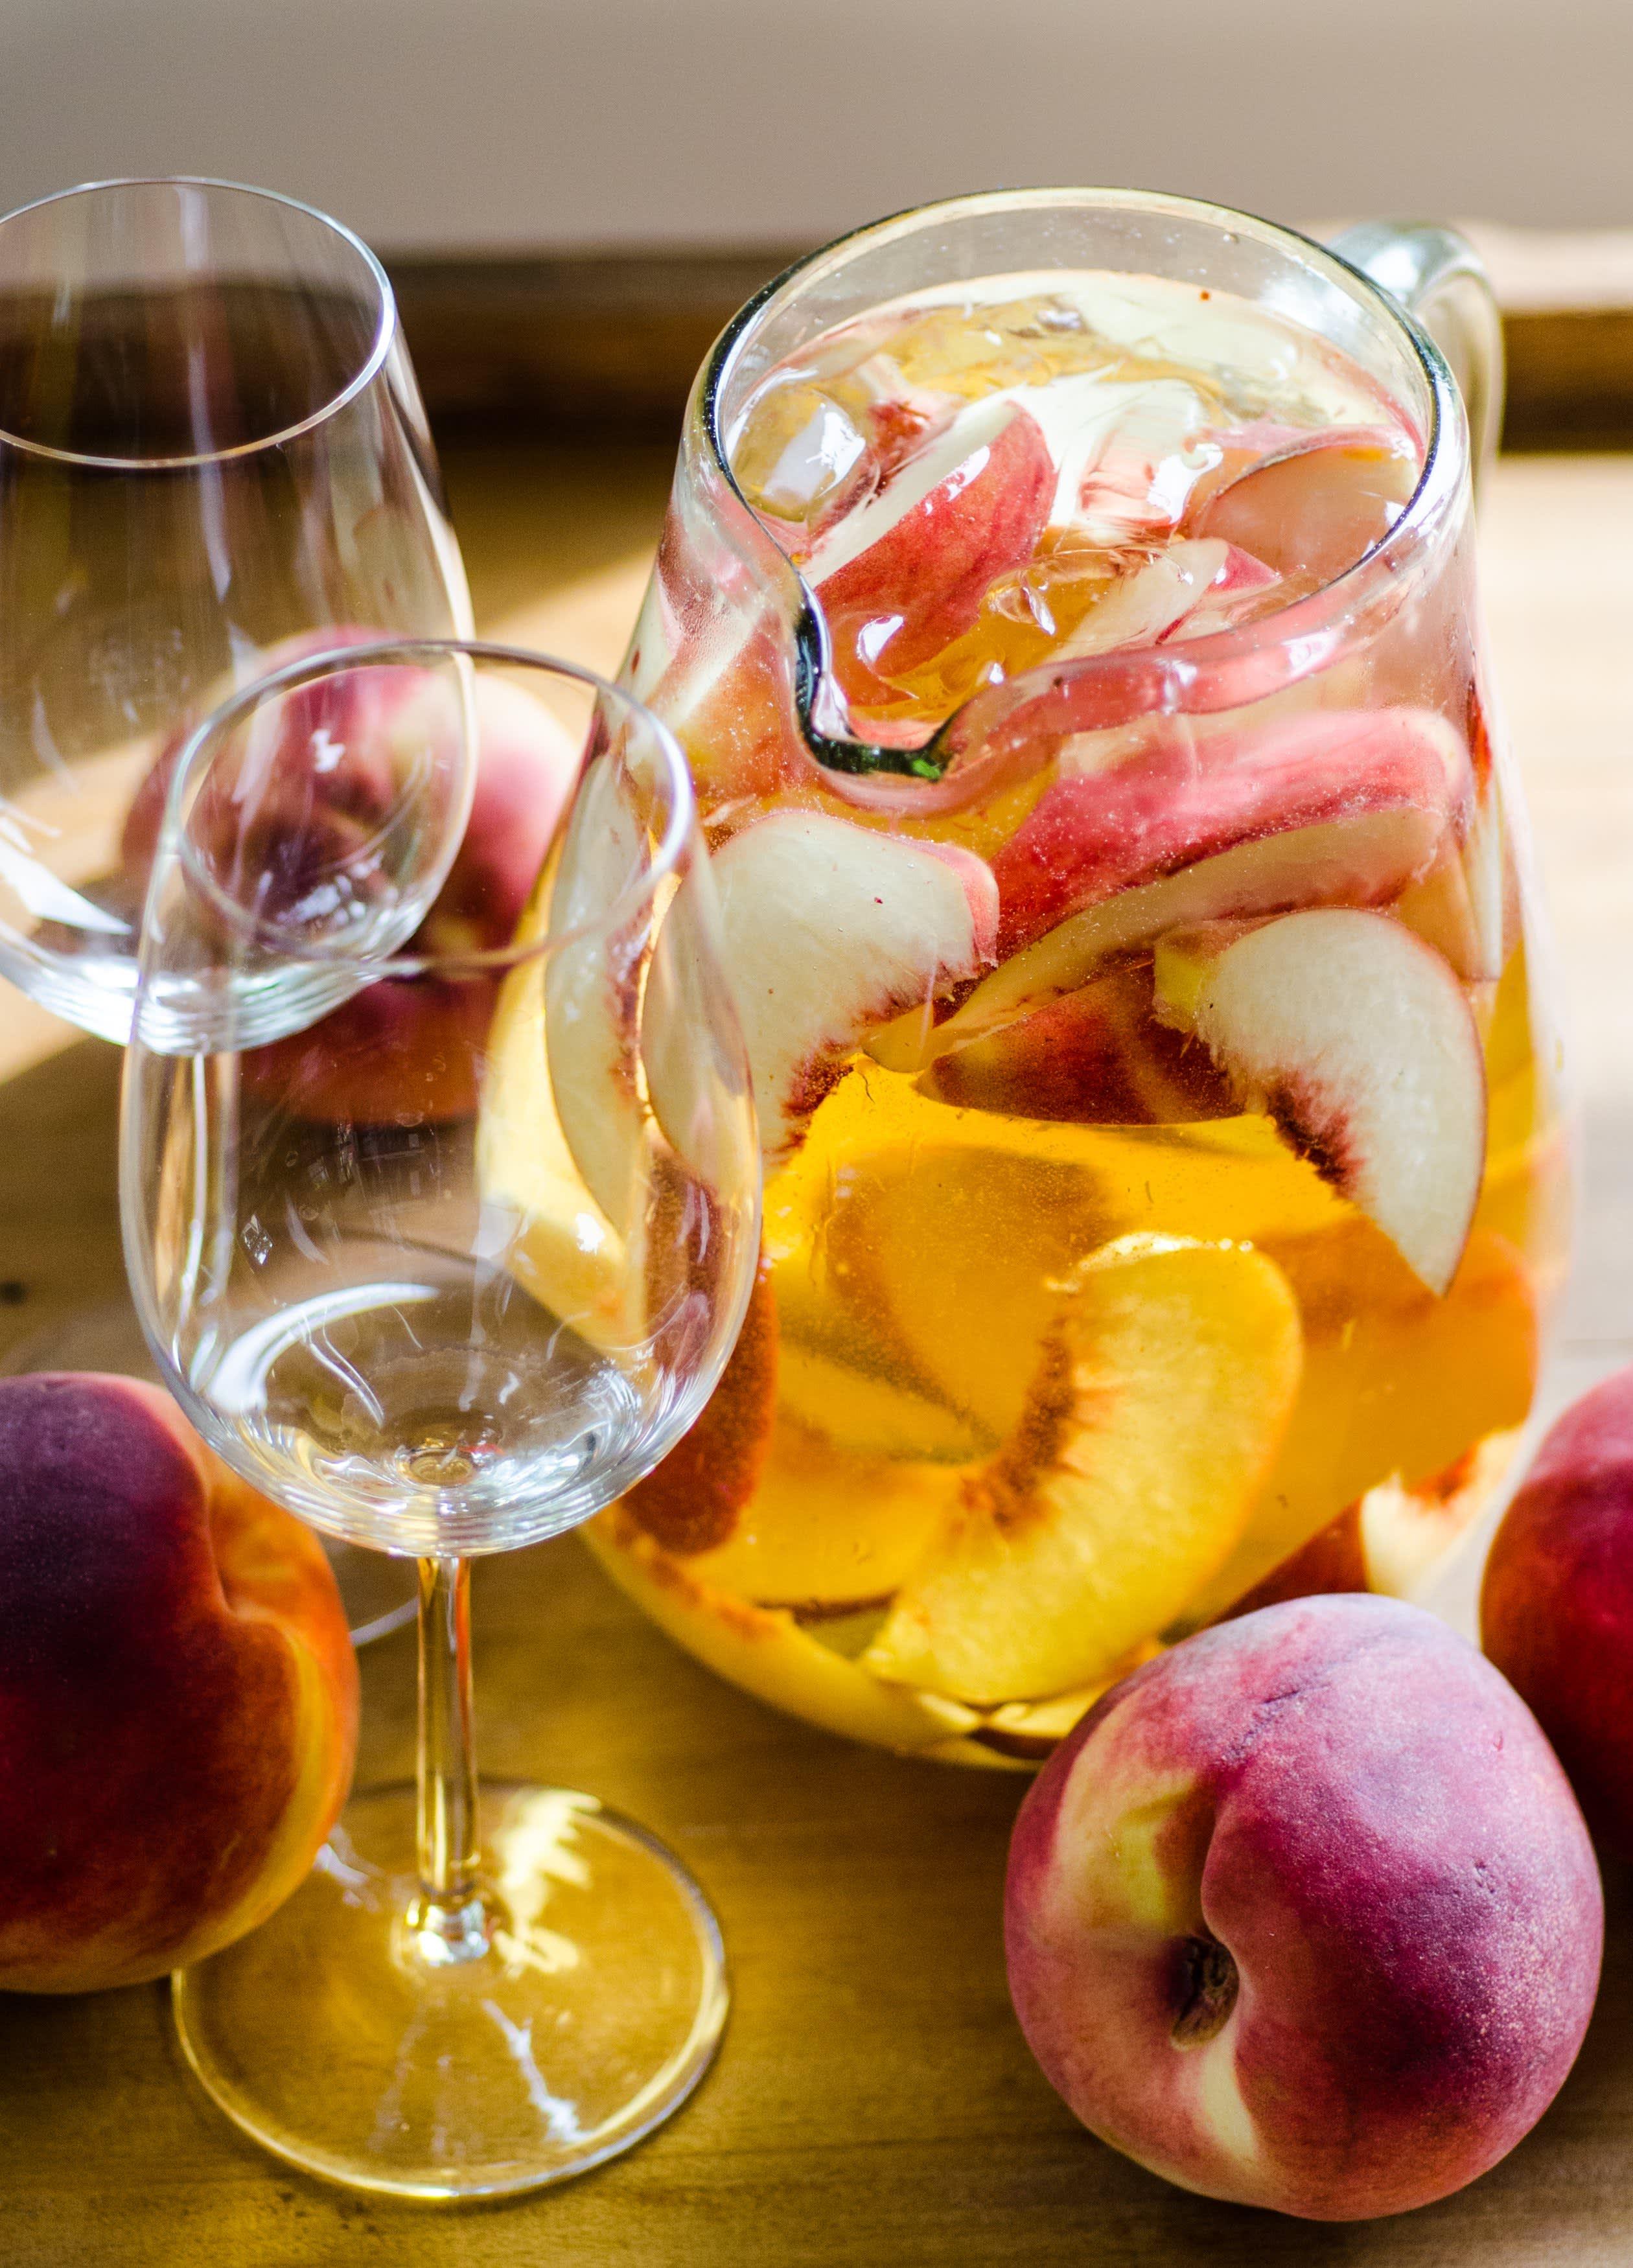 Pitcher Drink Recipe 4 Ingredient Sparkling White Peach Sangria